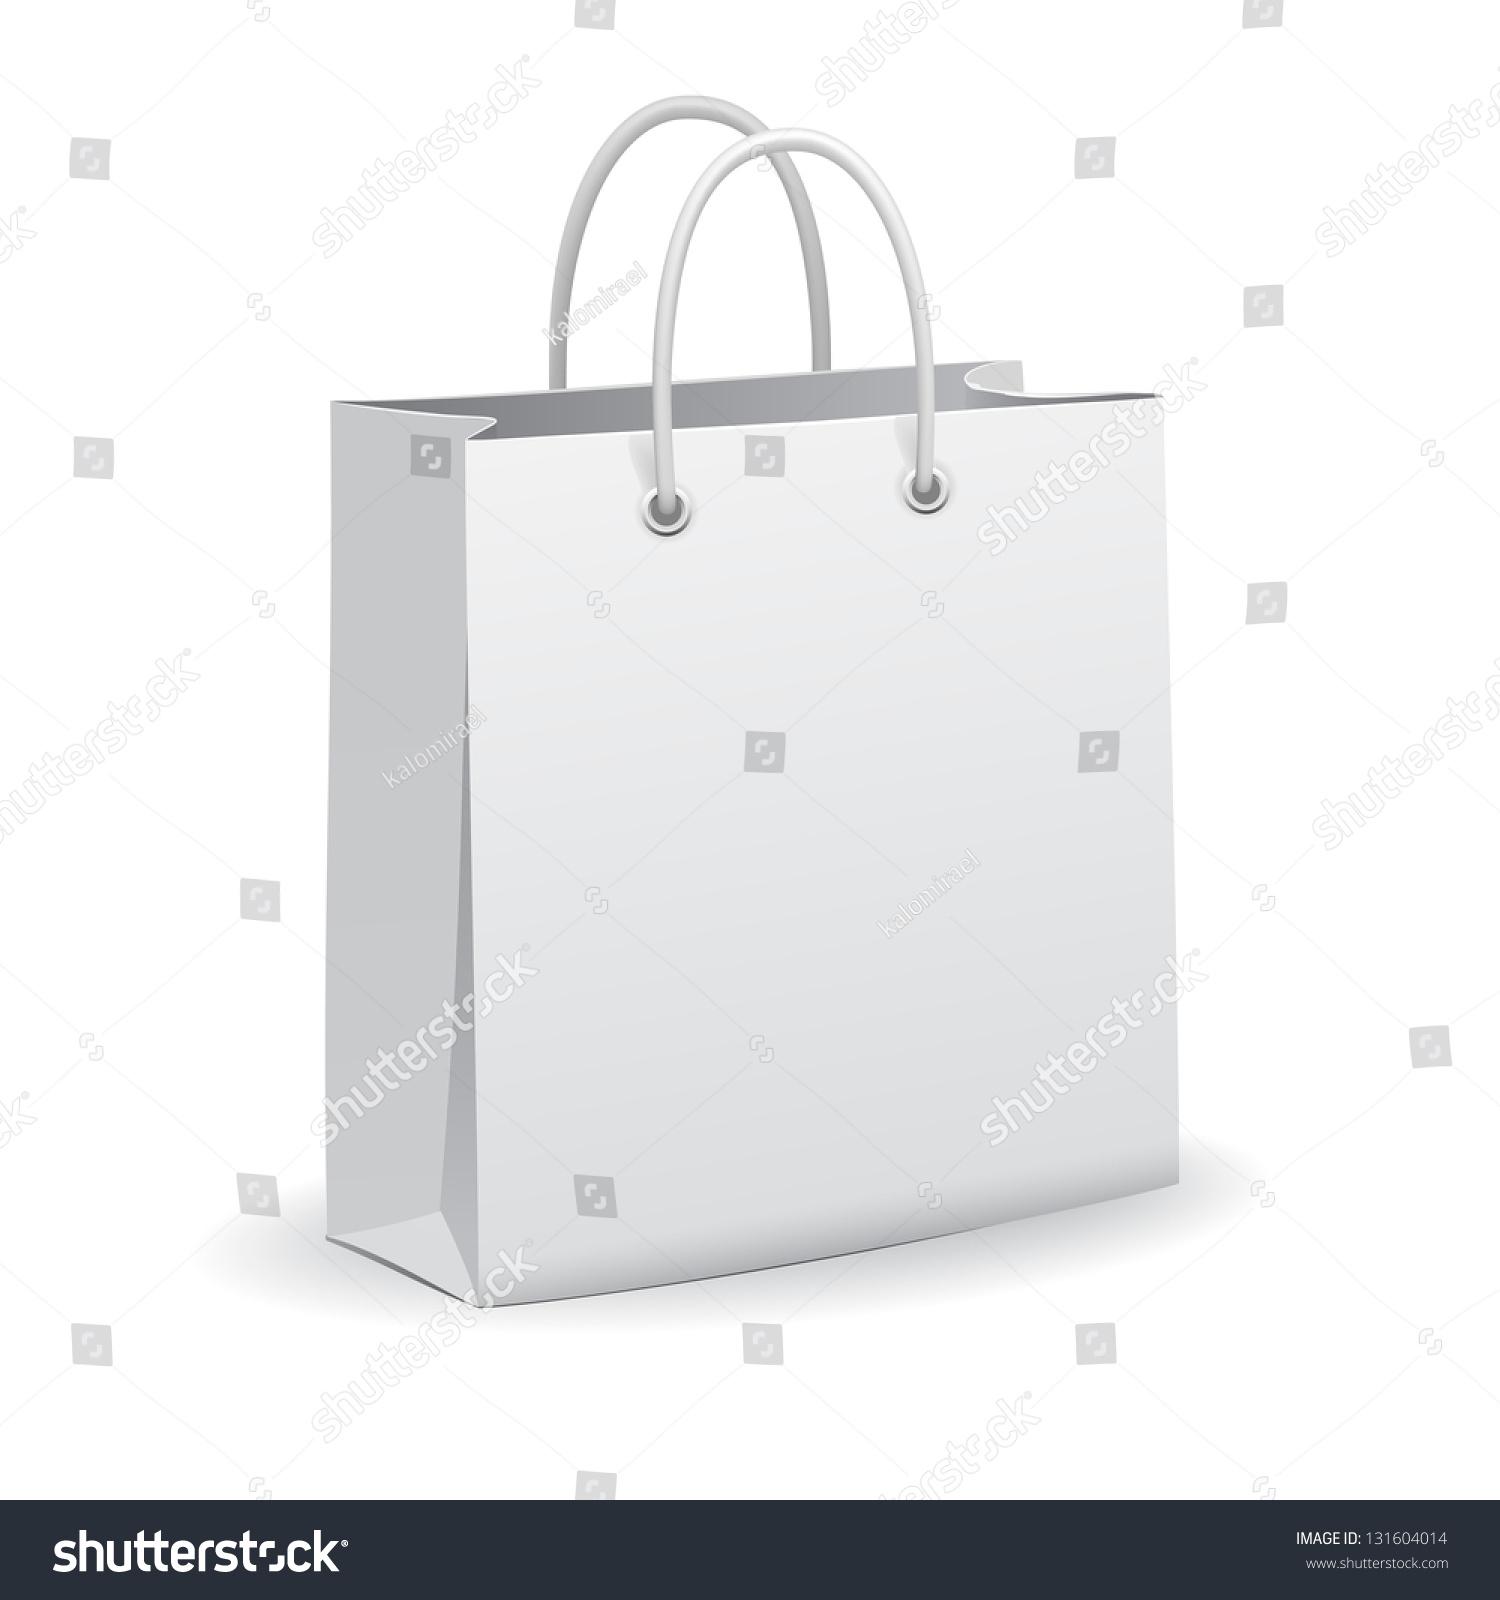 Paper bag vector - White Empty Paper Shopping Bag Vector